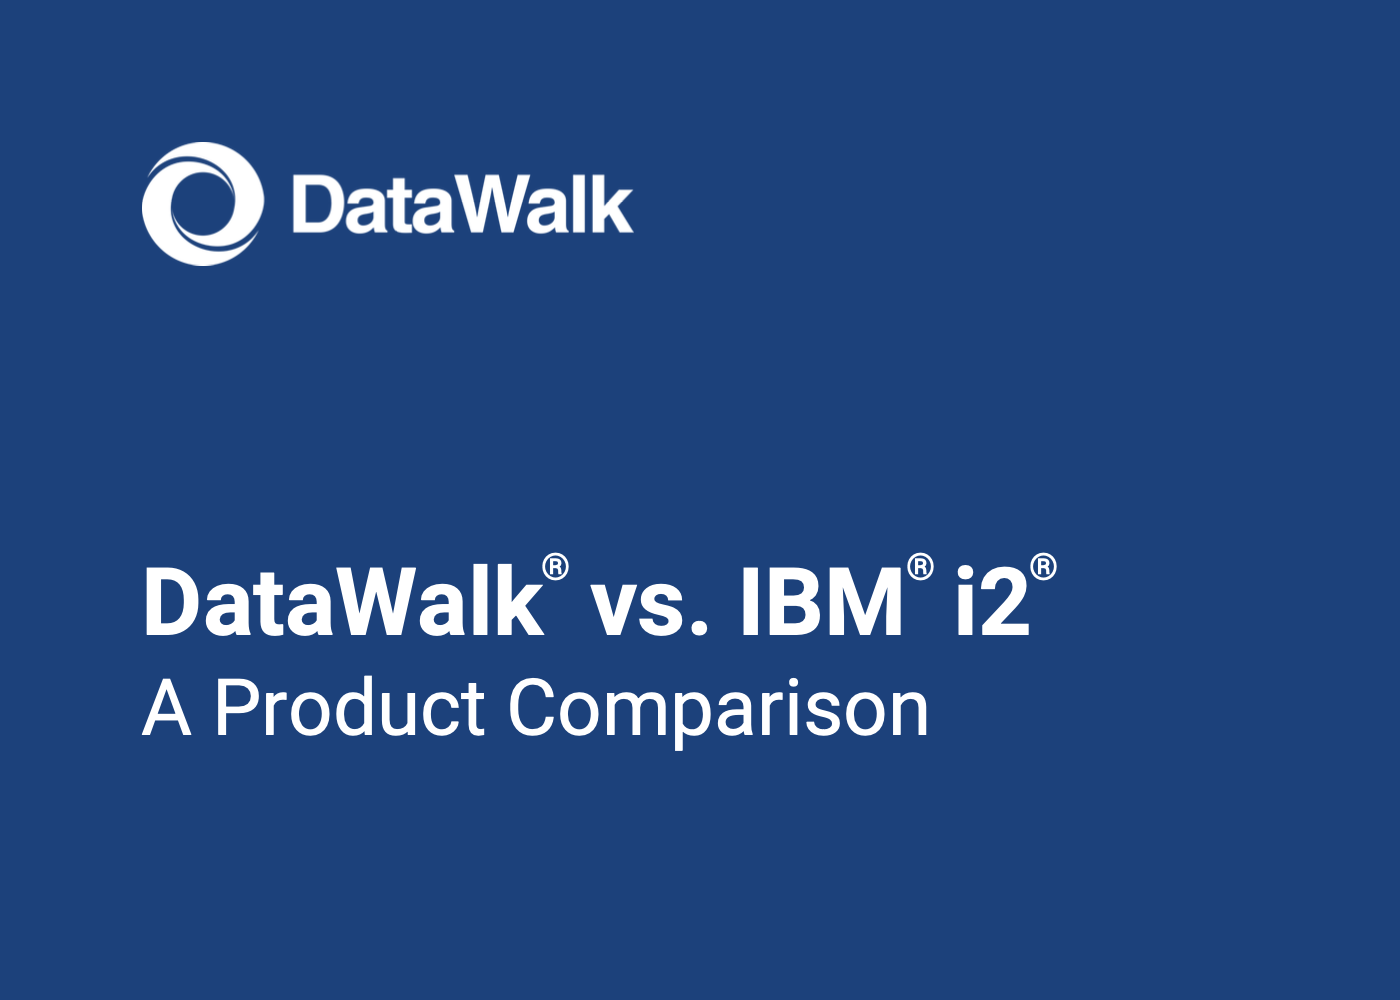 DataWalk vs IBM i2